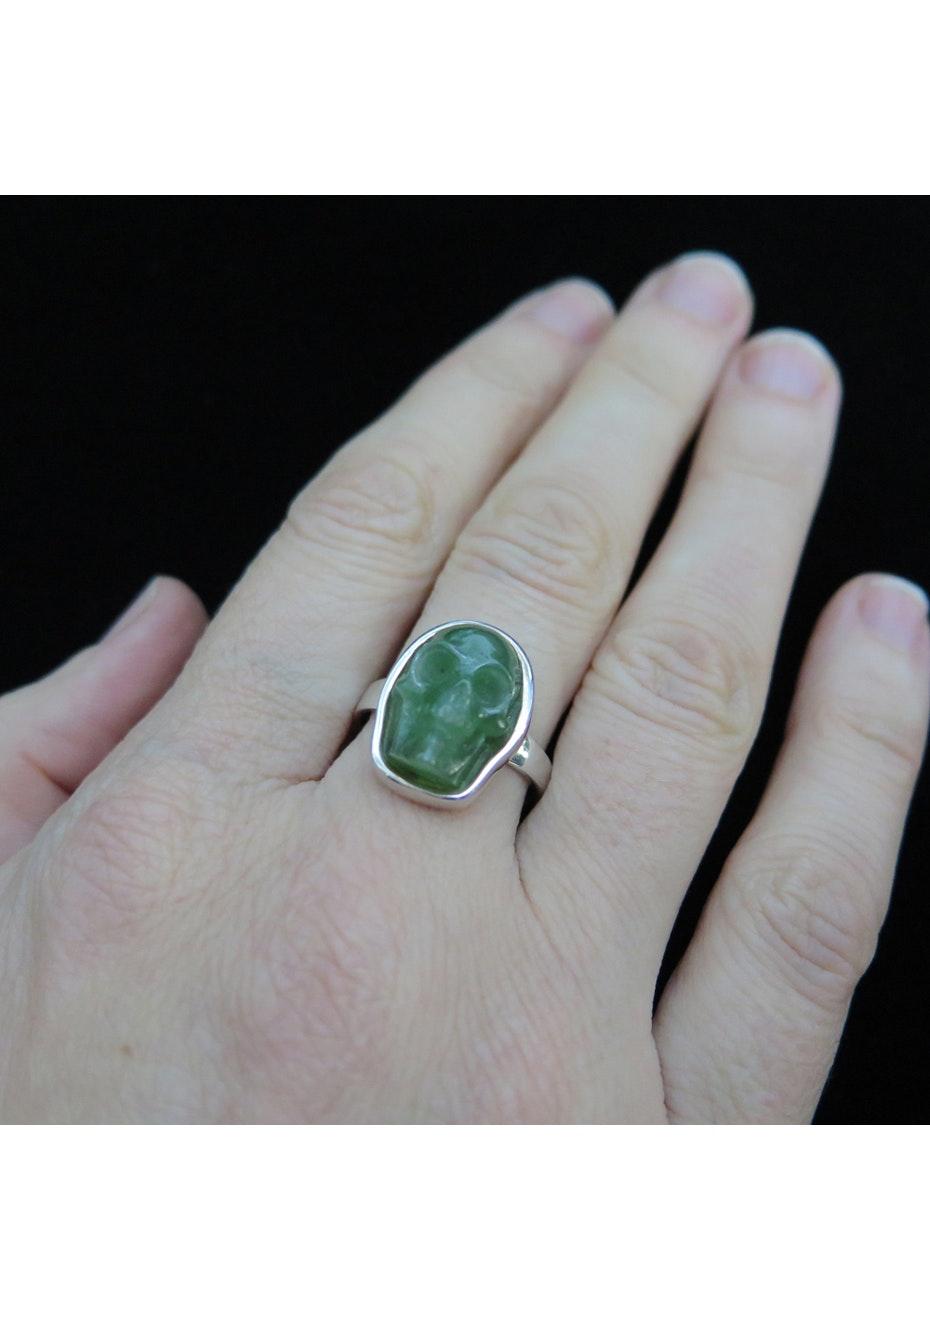 Nick Von K - NZ Greenstone Skull ring Small